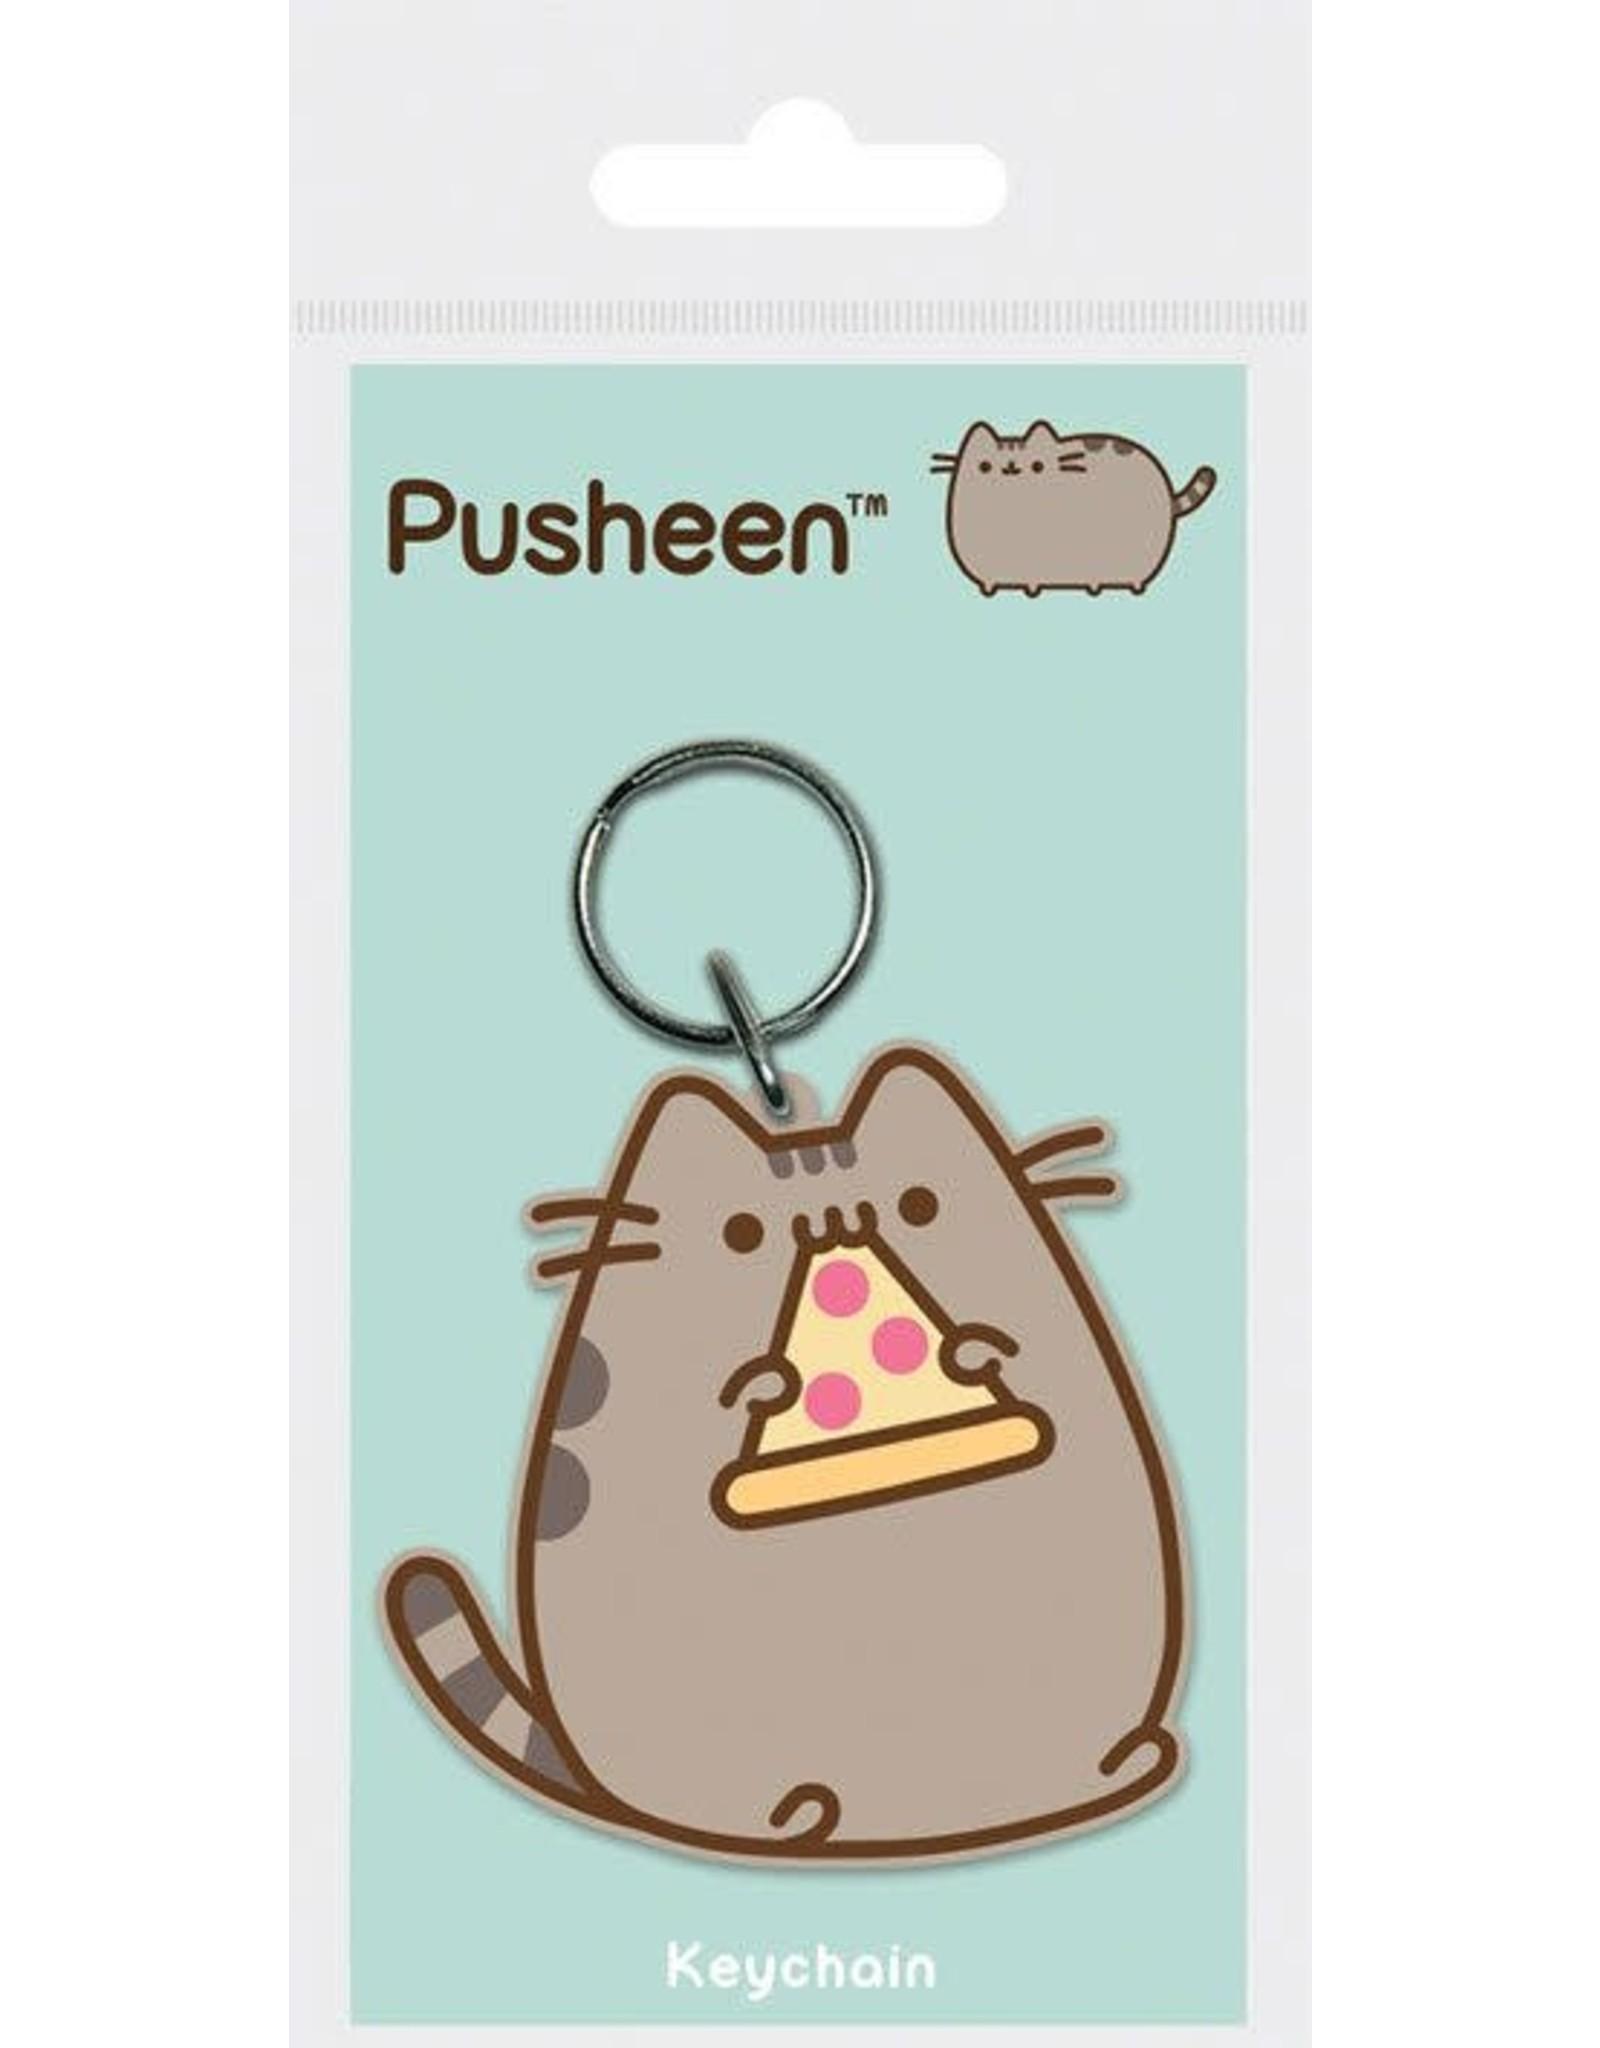 Pusheen - Pusheen with Pizza Rubber Keychain - 6 cm